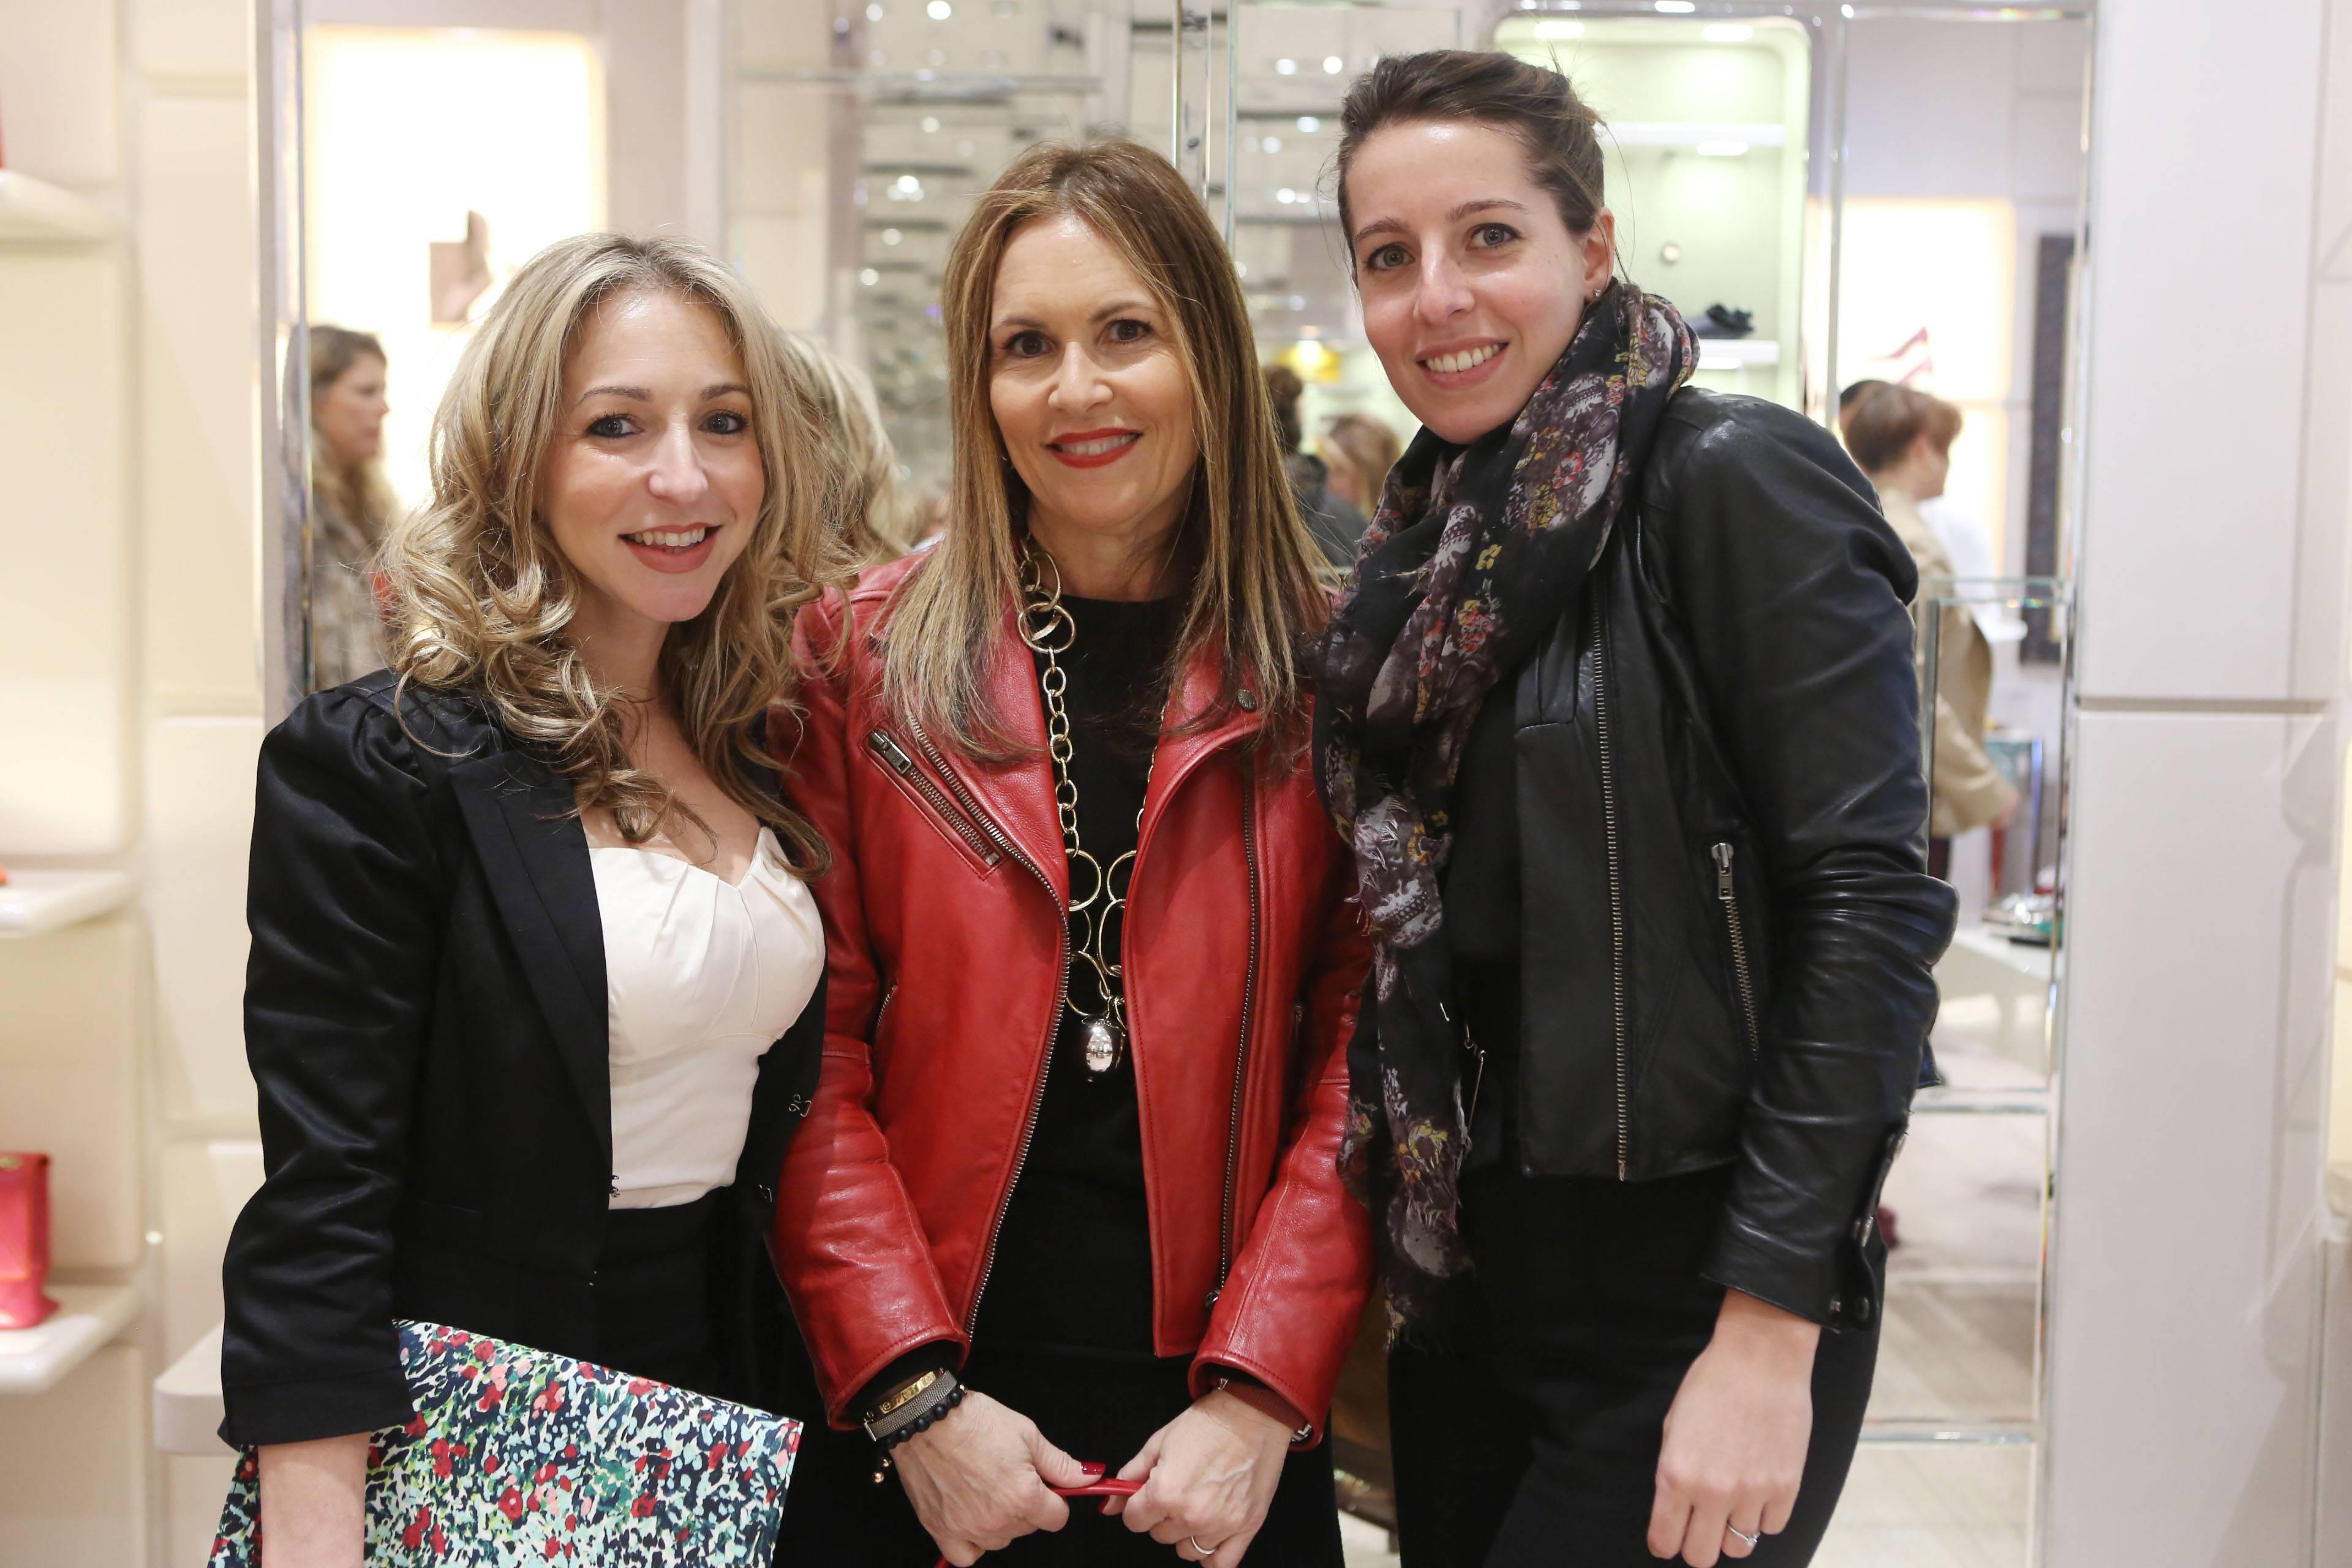 Amanda Alvarez, Robbin Newman, & Cederique Montagnon